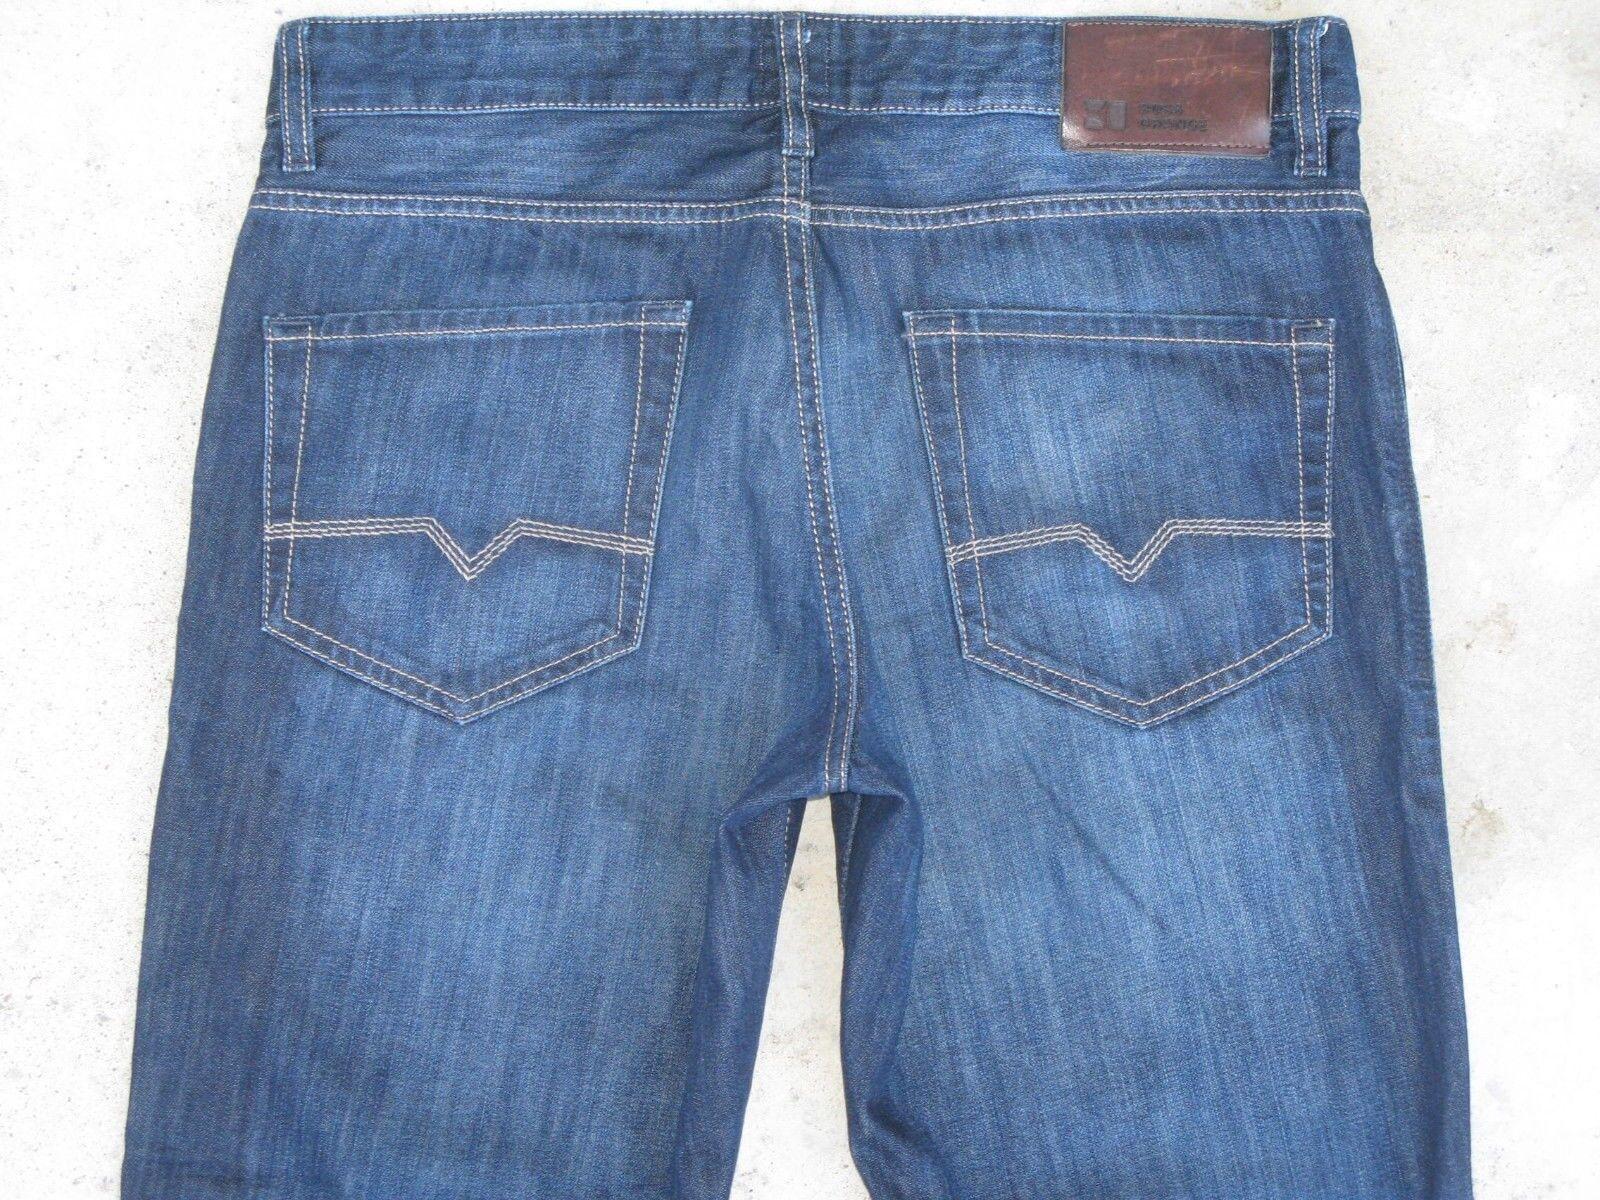 Hugo Boss orange 31 Mens Jeans Regular Fit Straight Sz 34 X 27  Dark bluee